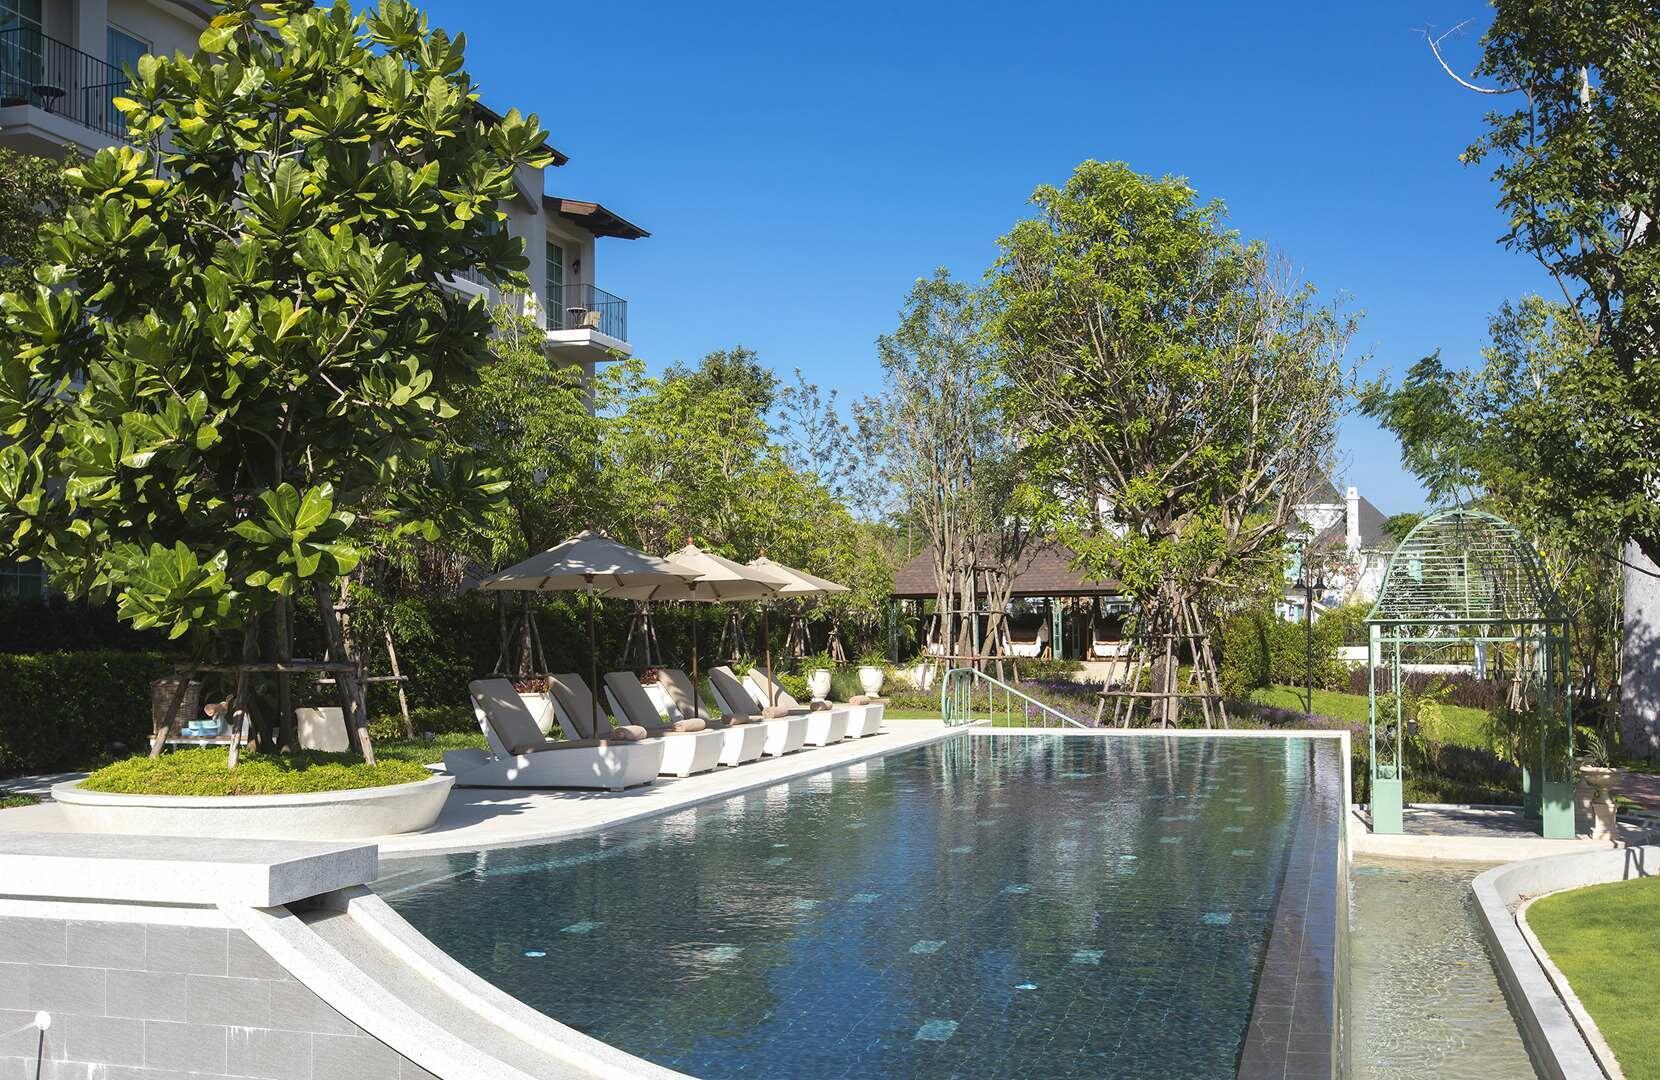 U Khao Yai Outdoor Swimming Pool